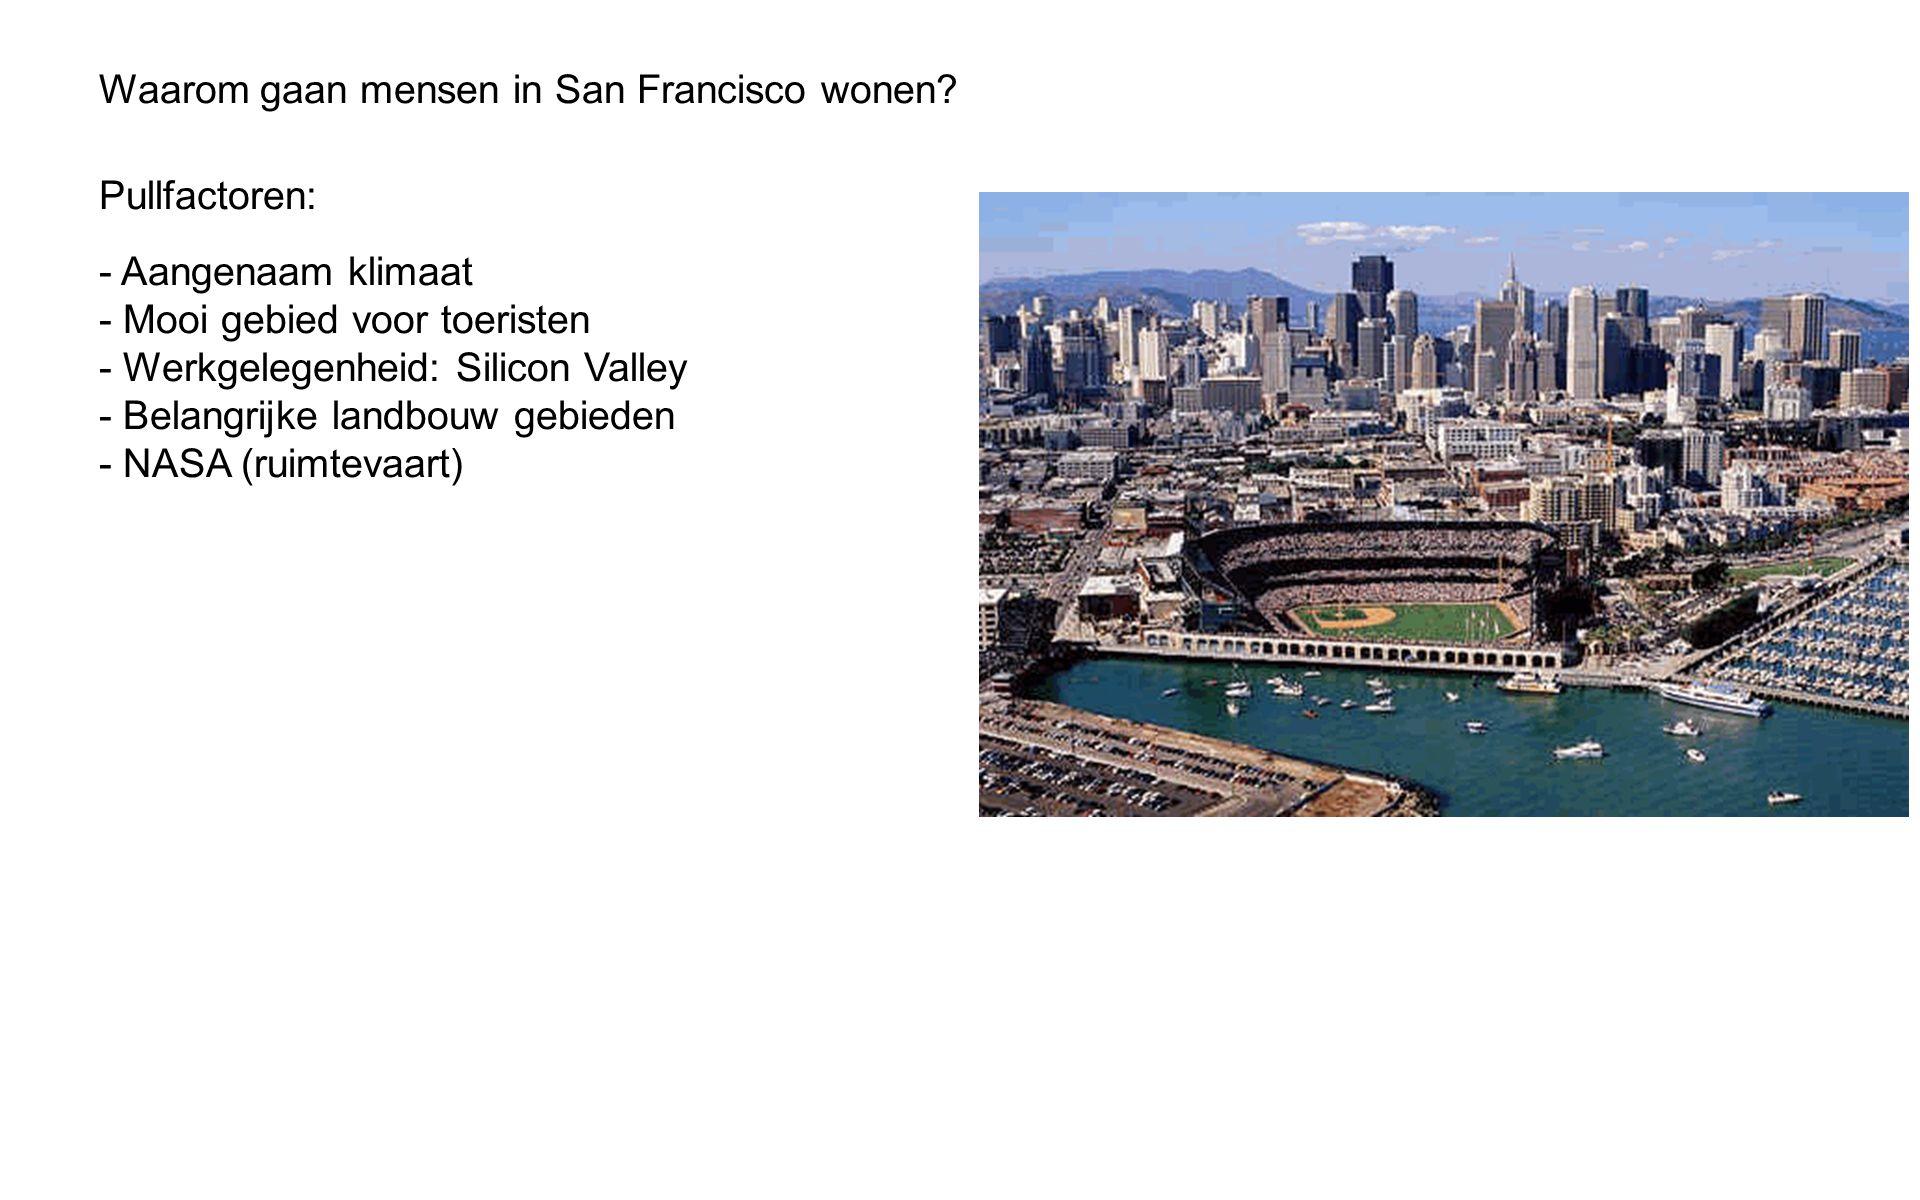 Waarom gaan mensen in San Francisco wonen